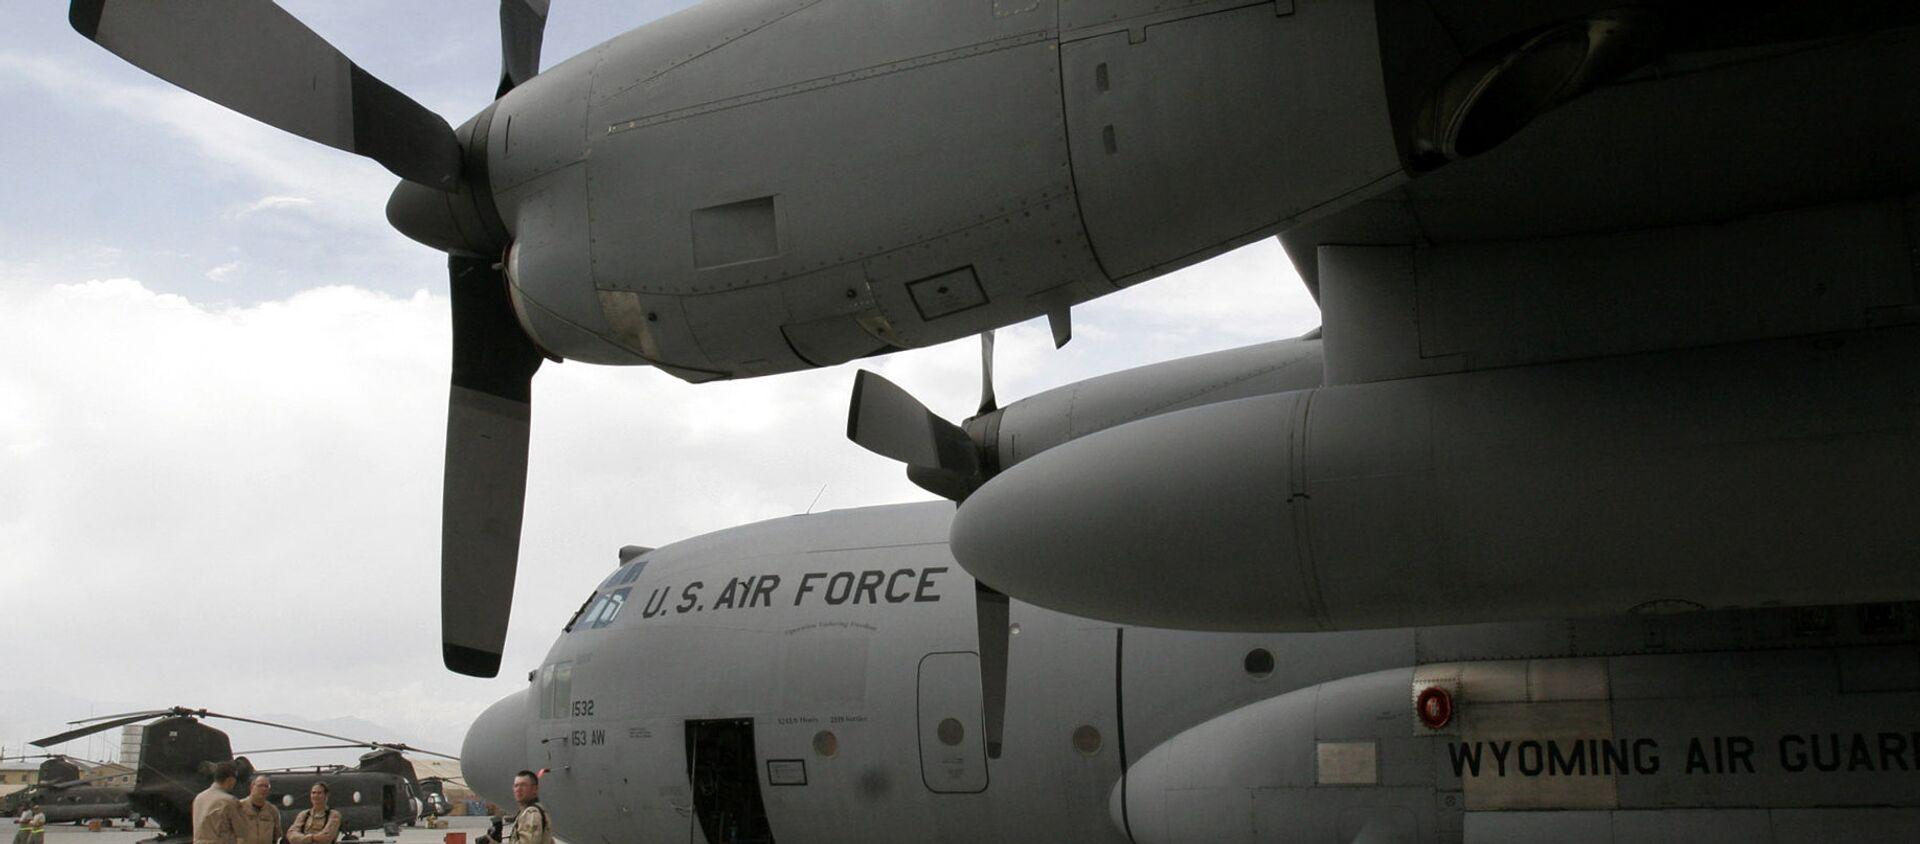 U.S. soldiers are seen near a U.S. air force plane on the runway at the main U.S. air base in Bagram, Afghanistan. (File) - Sputnik International, 1920, 31.07.2021